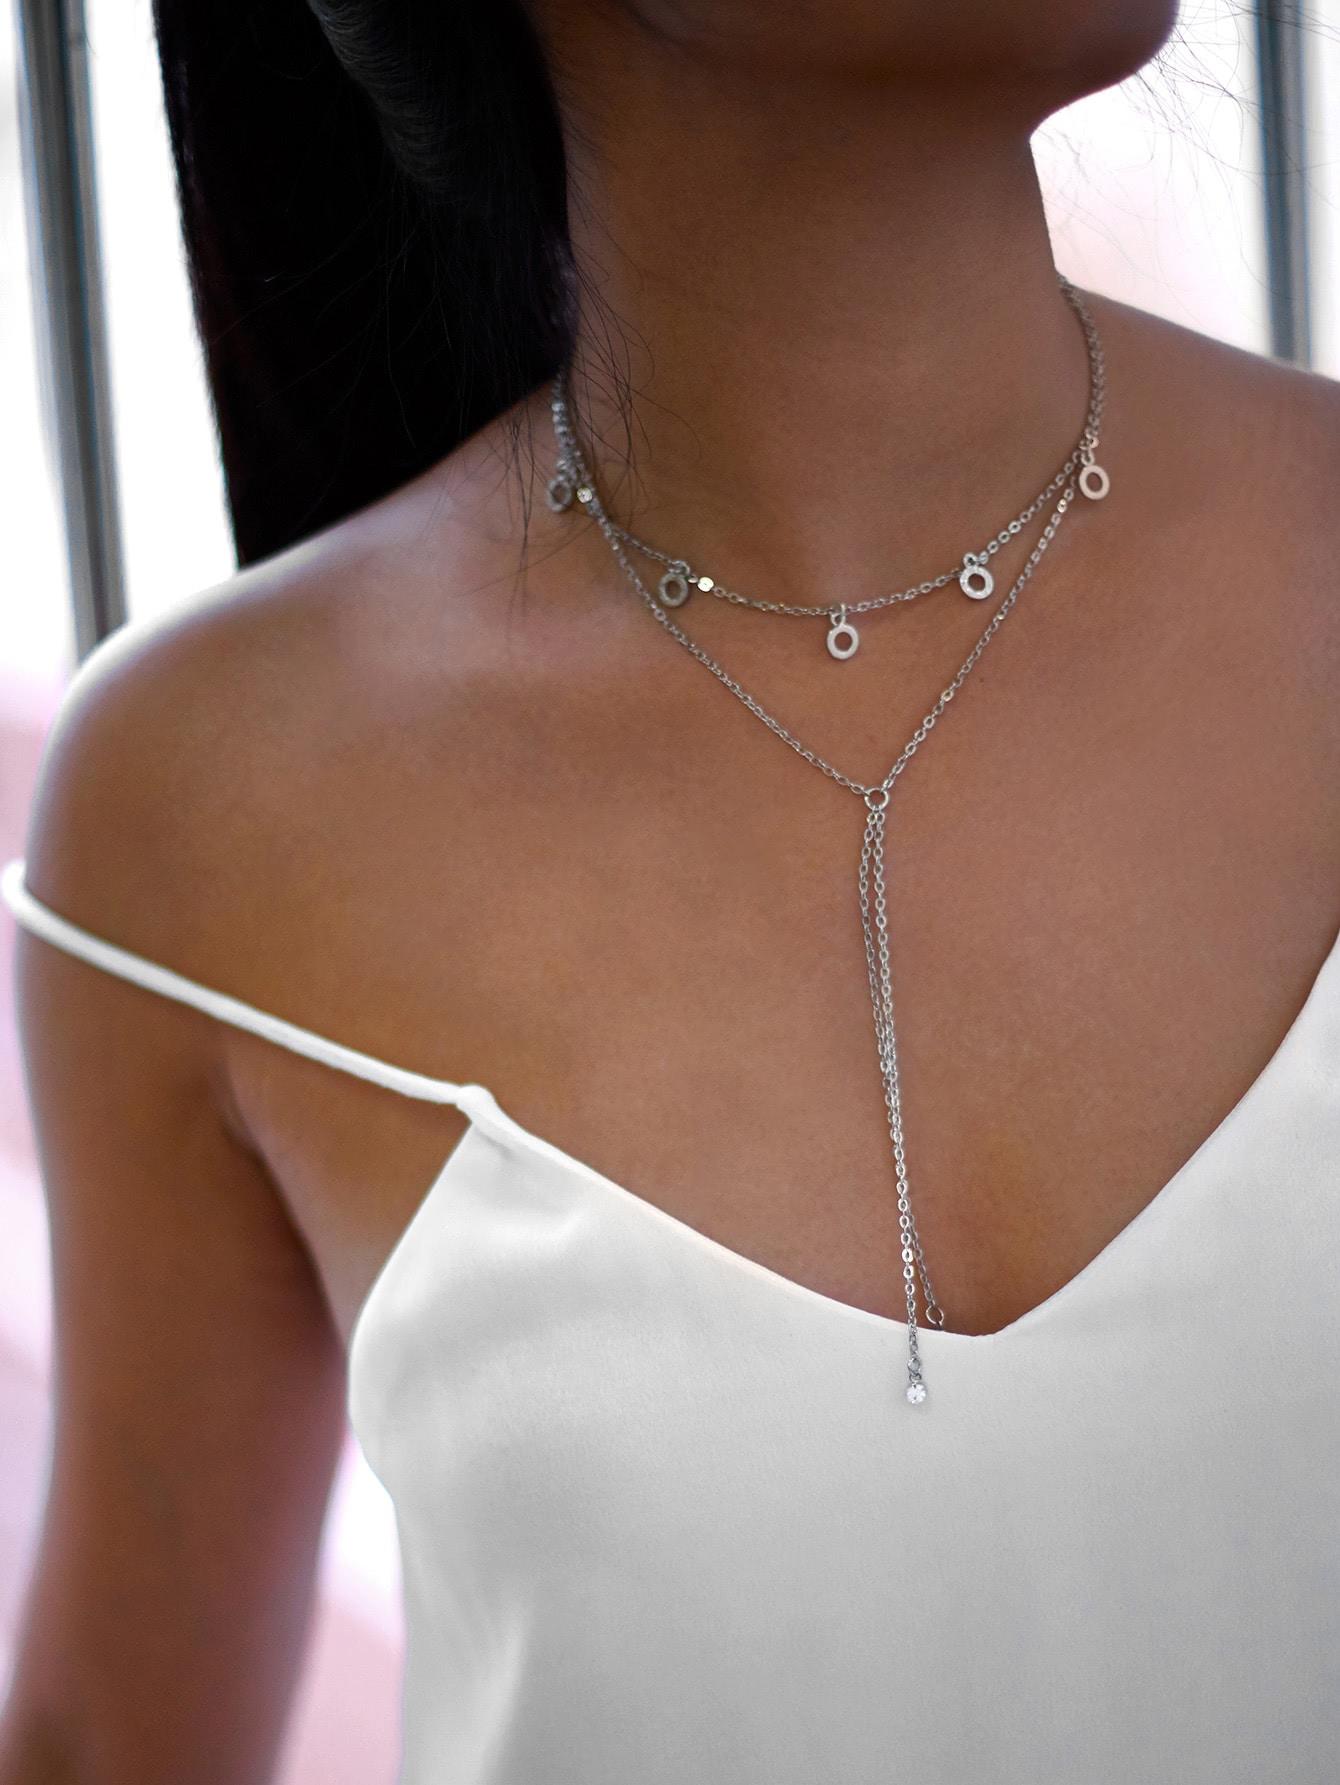 Rhinestone Detail Layered Chain Necklace